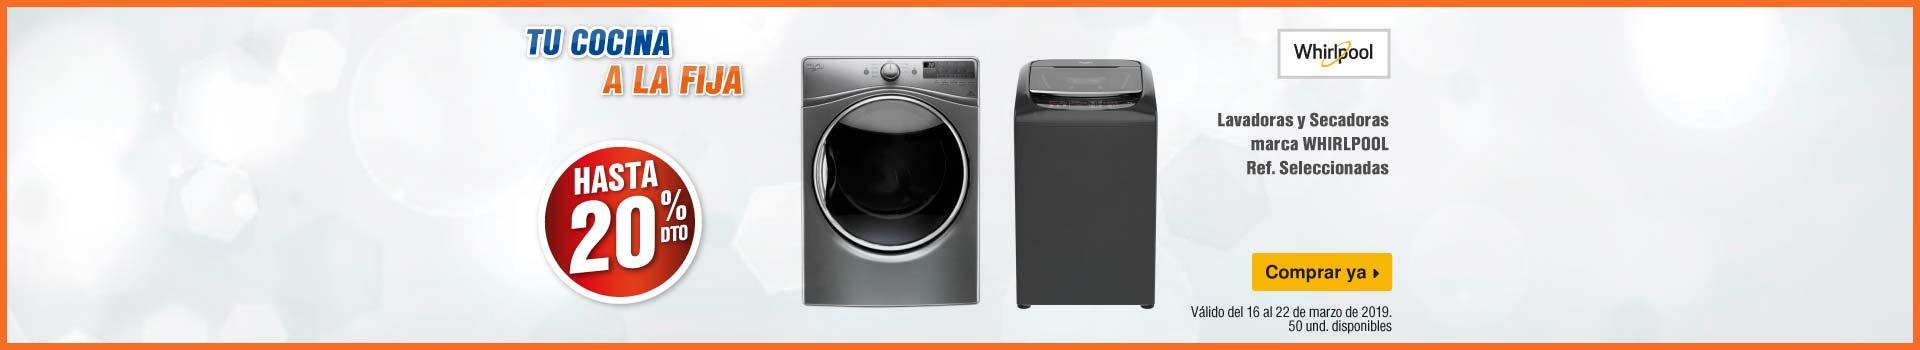 AK-KT-mayores-1-ELECT-BCAT-lavadoras-WHIRLPOOL-160319